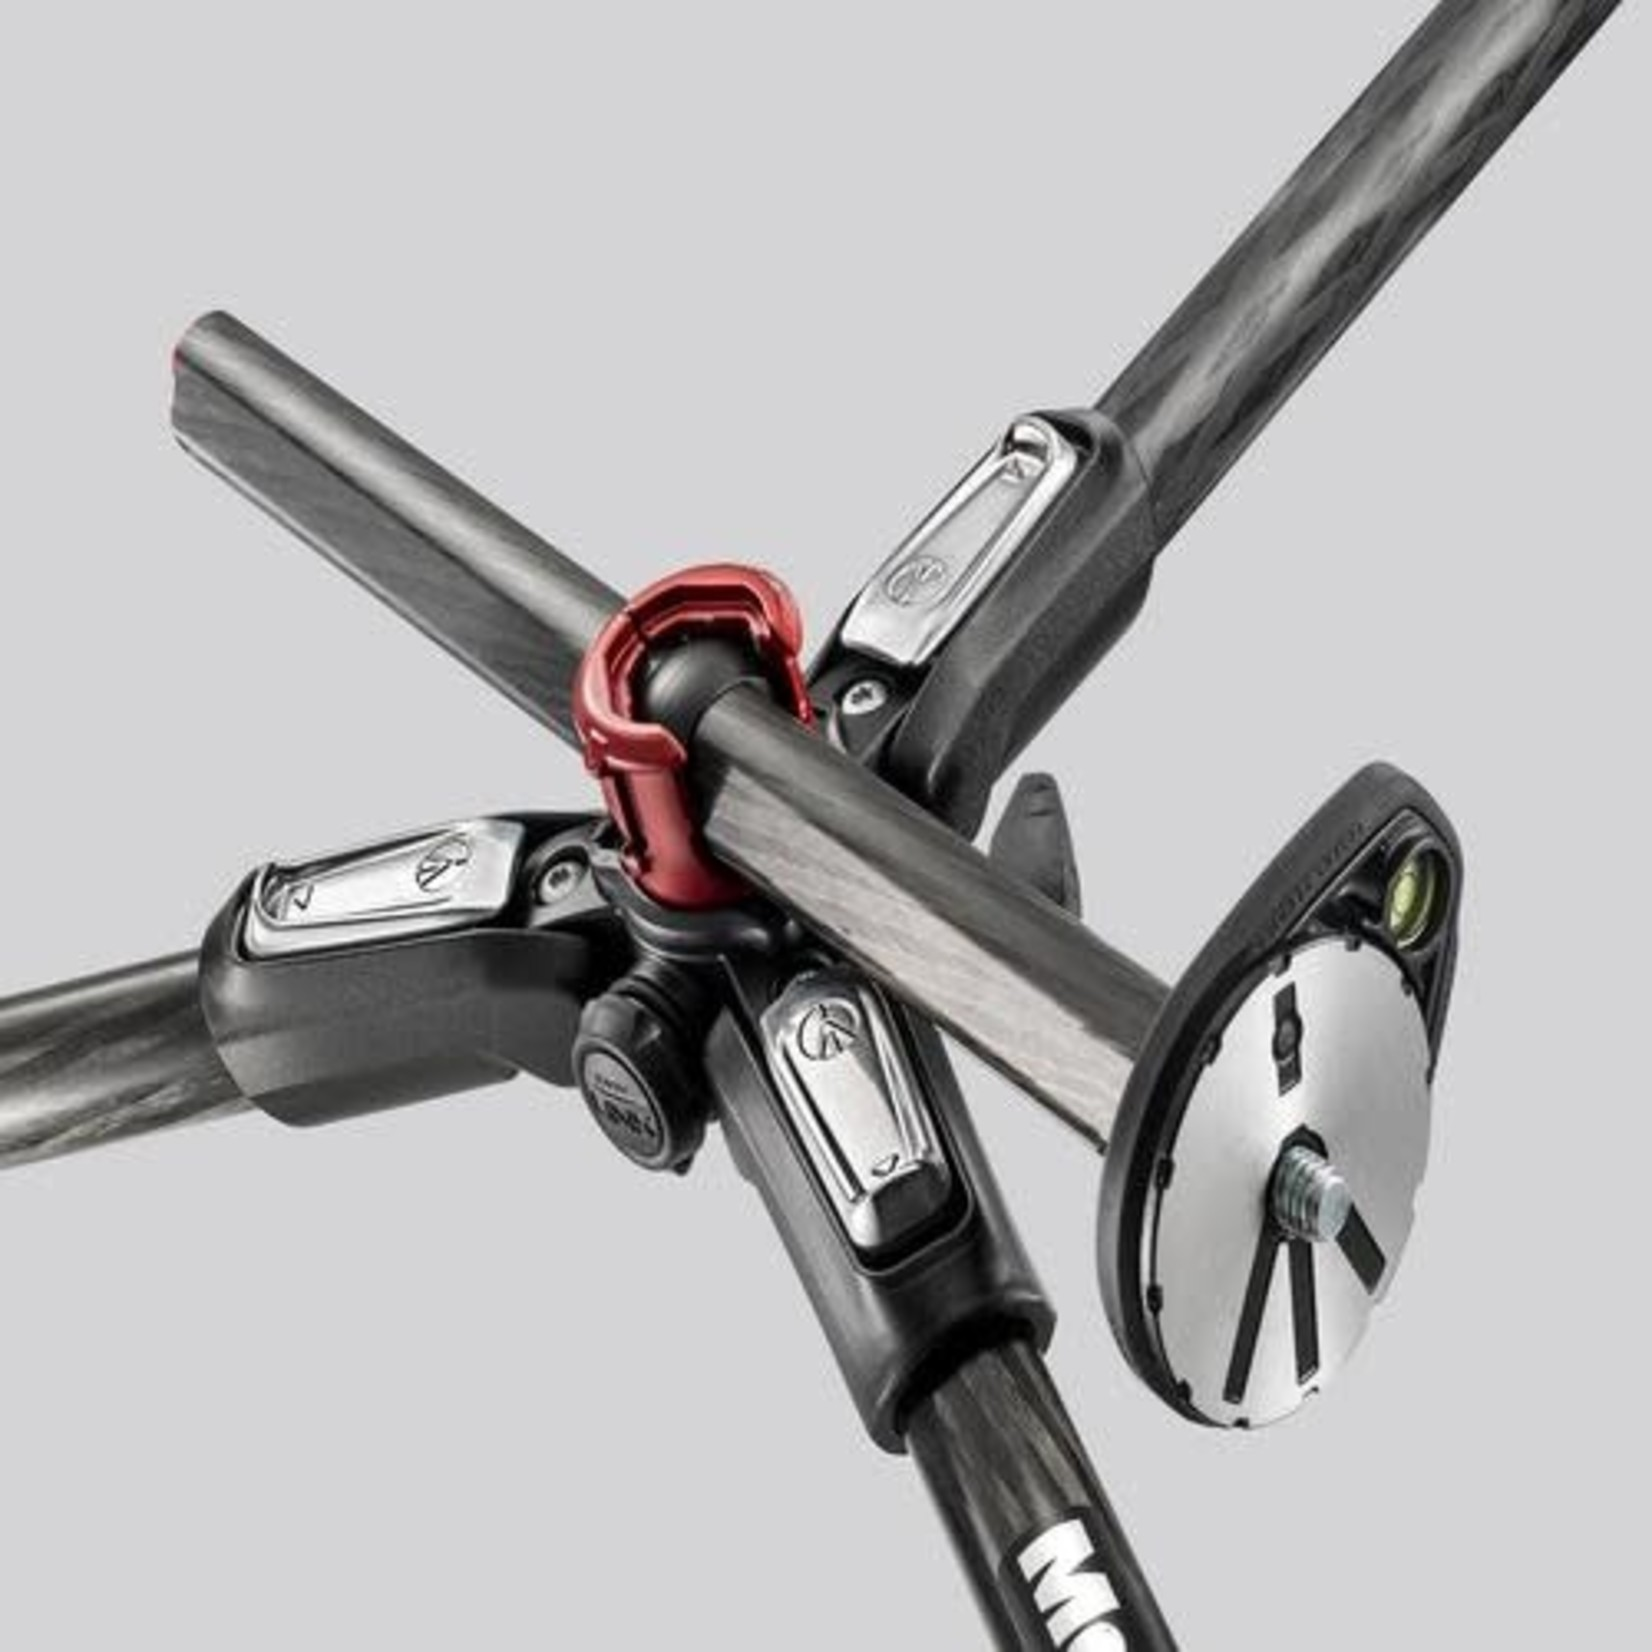 Manfrotto Manfrotto MT190CXPRO4 Carbon Fiber Tripod